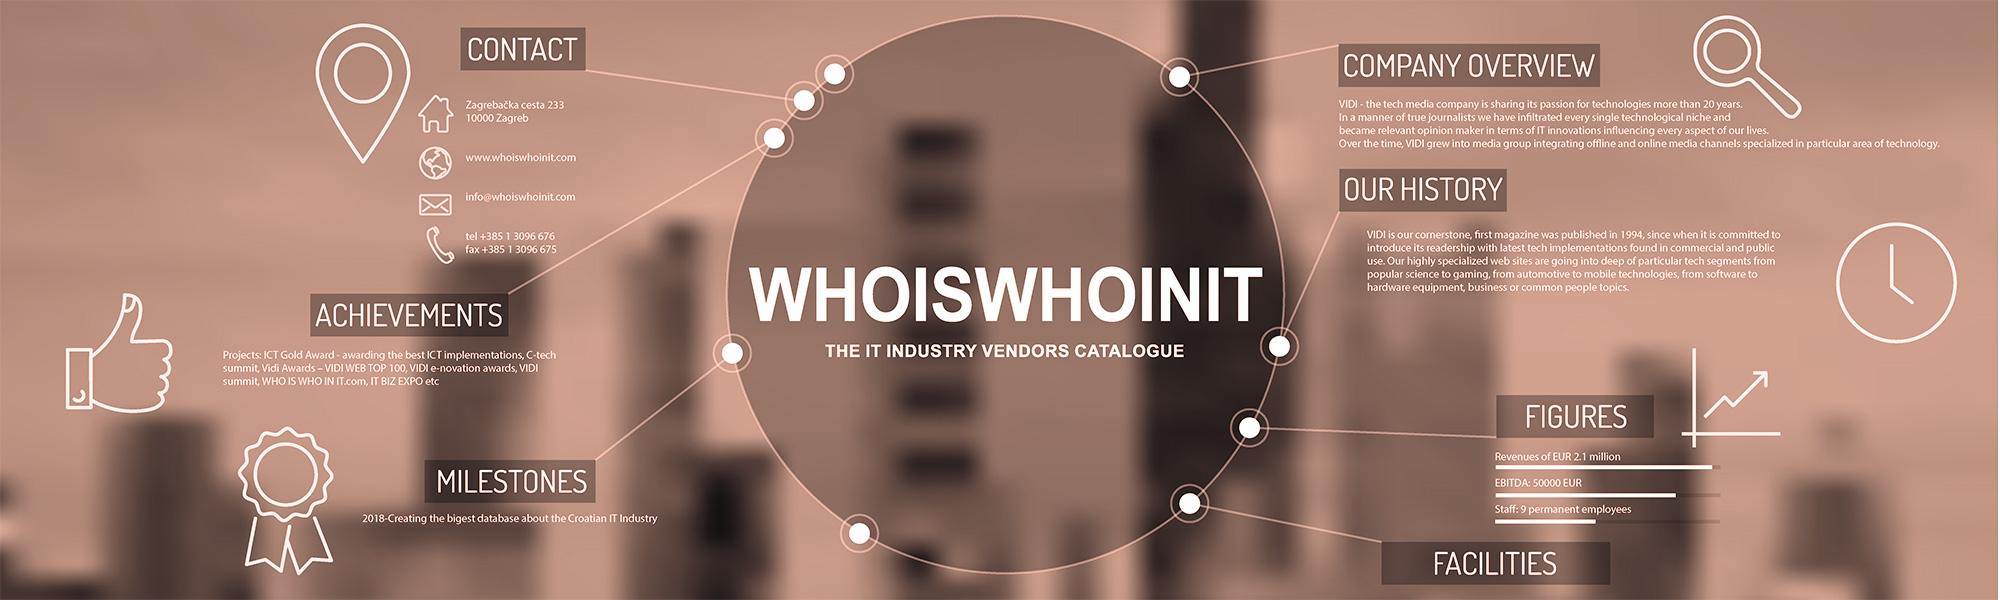 WHOISWHO